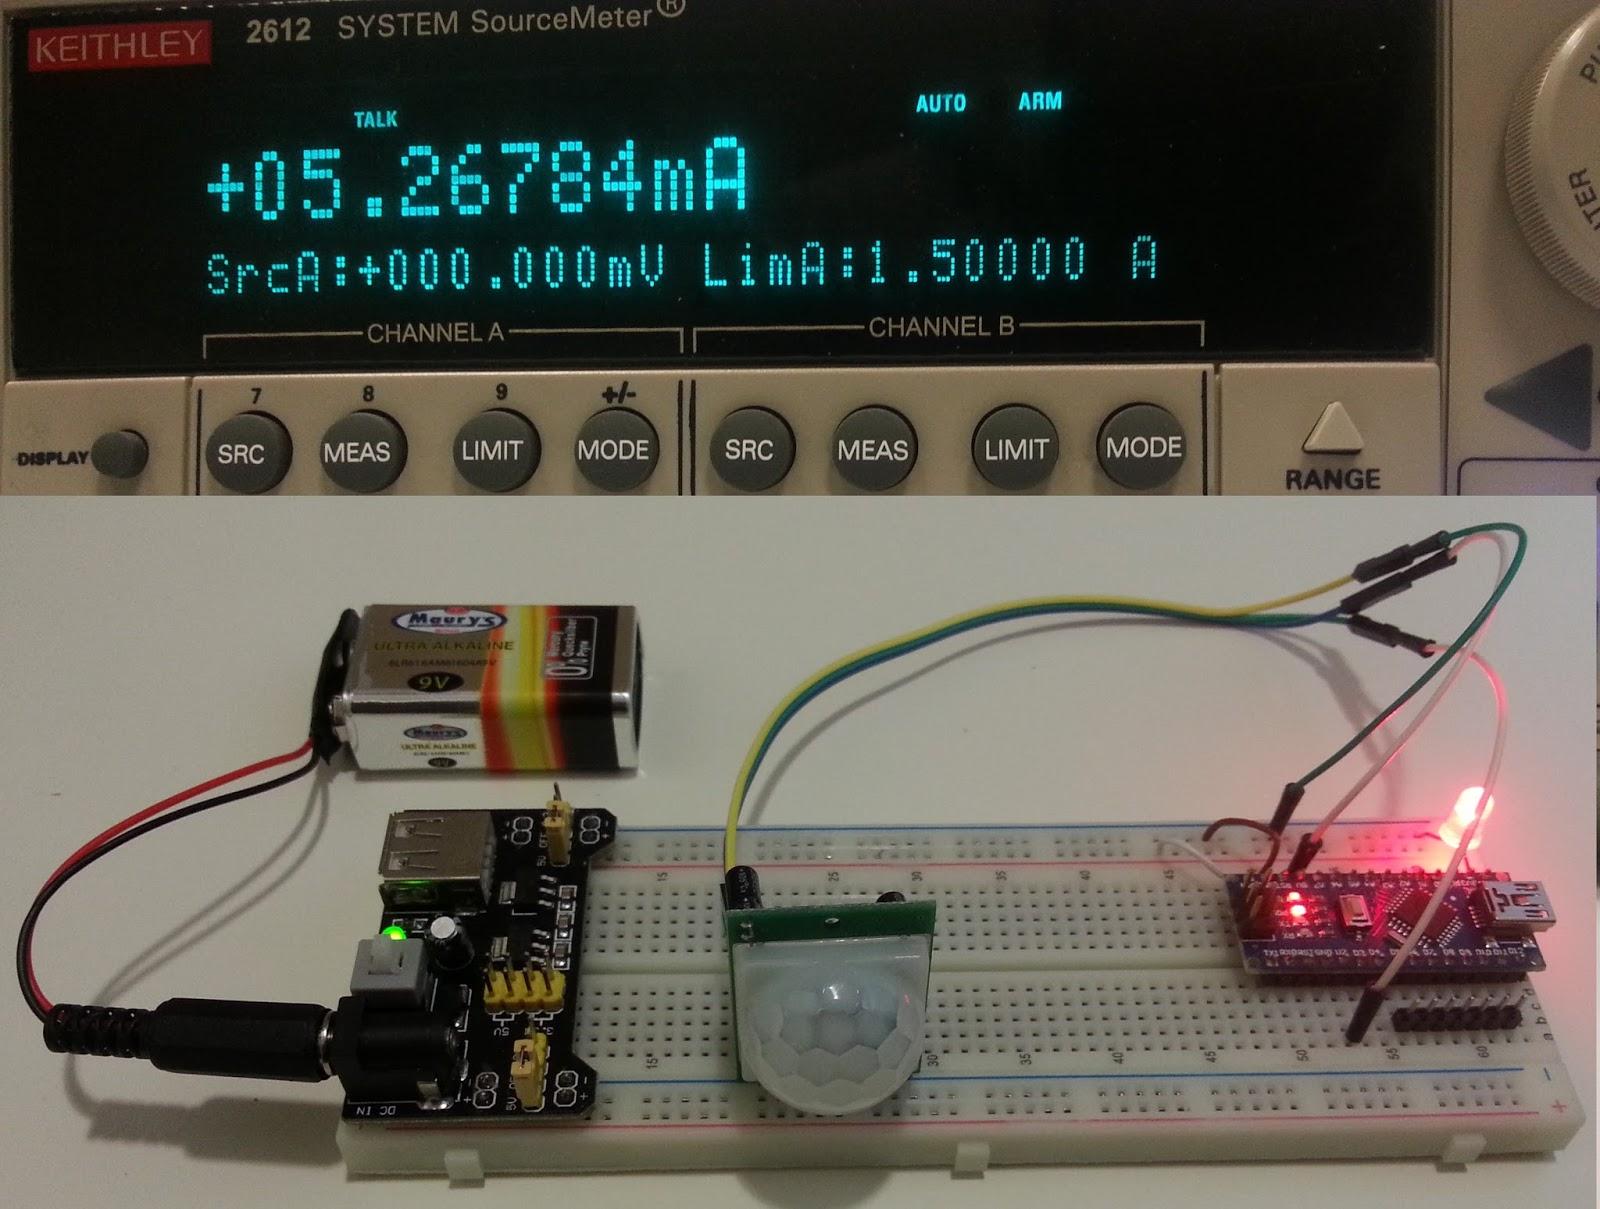 Pir Motion Sensor Circuit Diagram Also Pir Motion Sensor Wiring